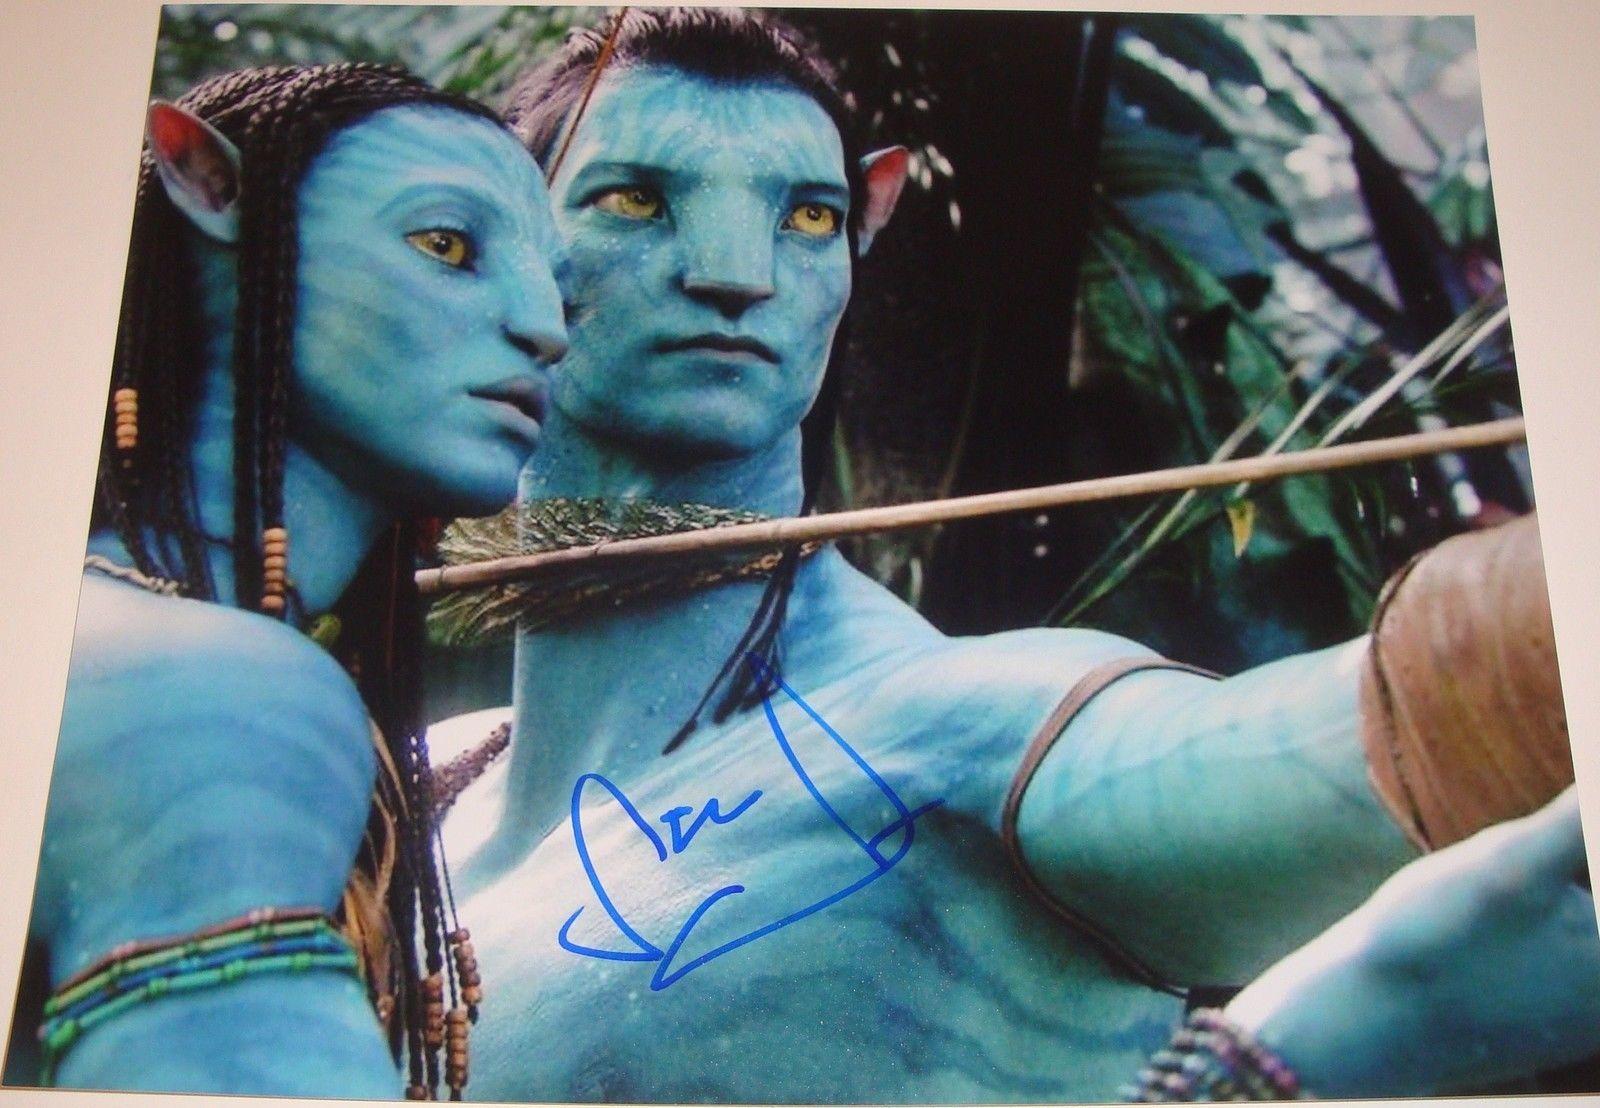 Sam Worthington Signed 11x14 Photo w/COA Proof Avatar Clash of the Titans A